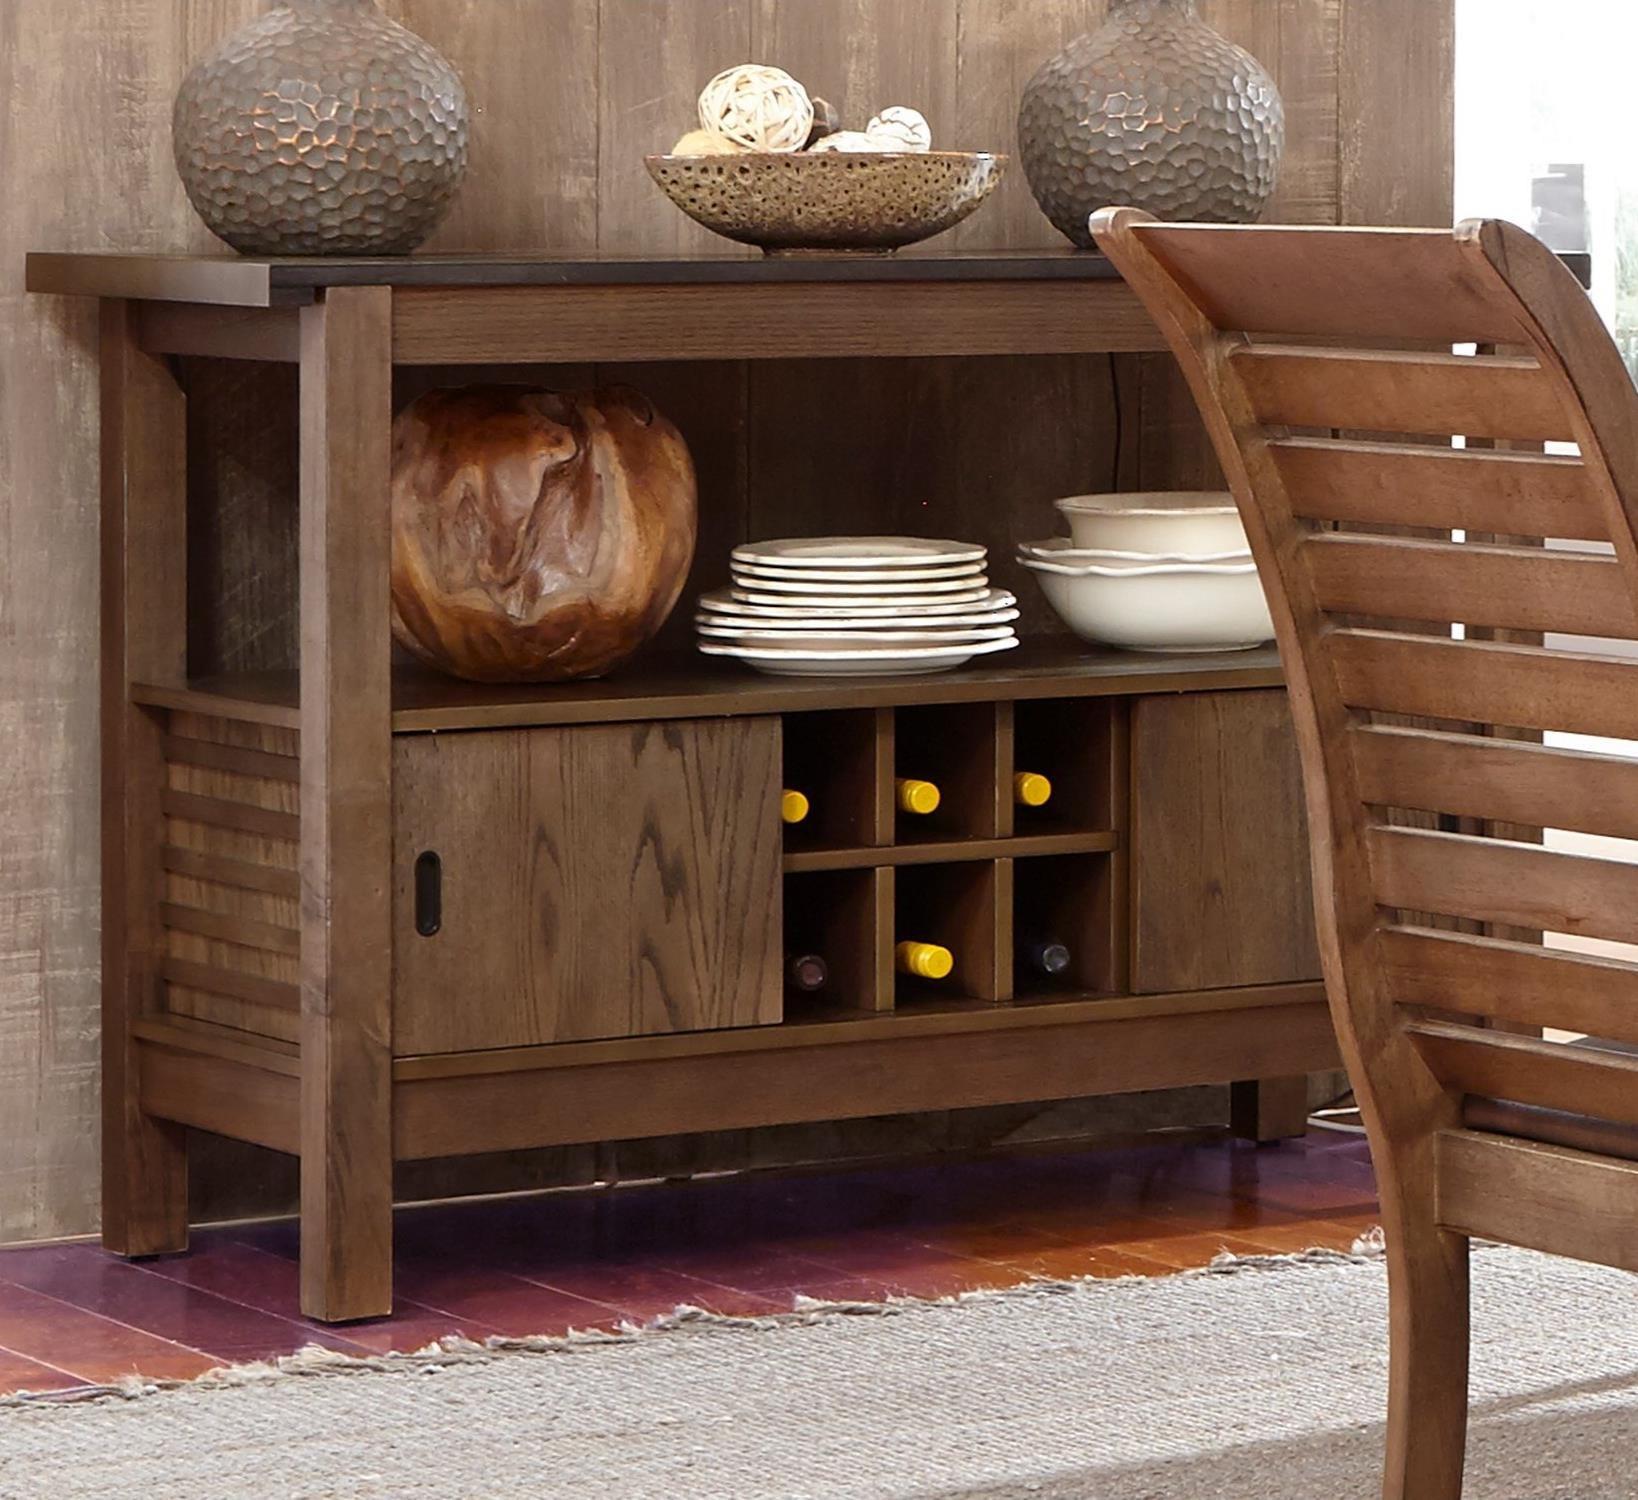 Liberty Furniture Bayside 2 Door Server With Wine Bottle Storage Prime Brothers Furniture